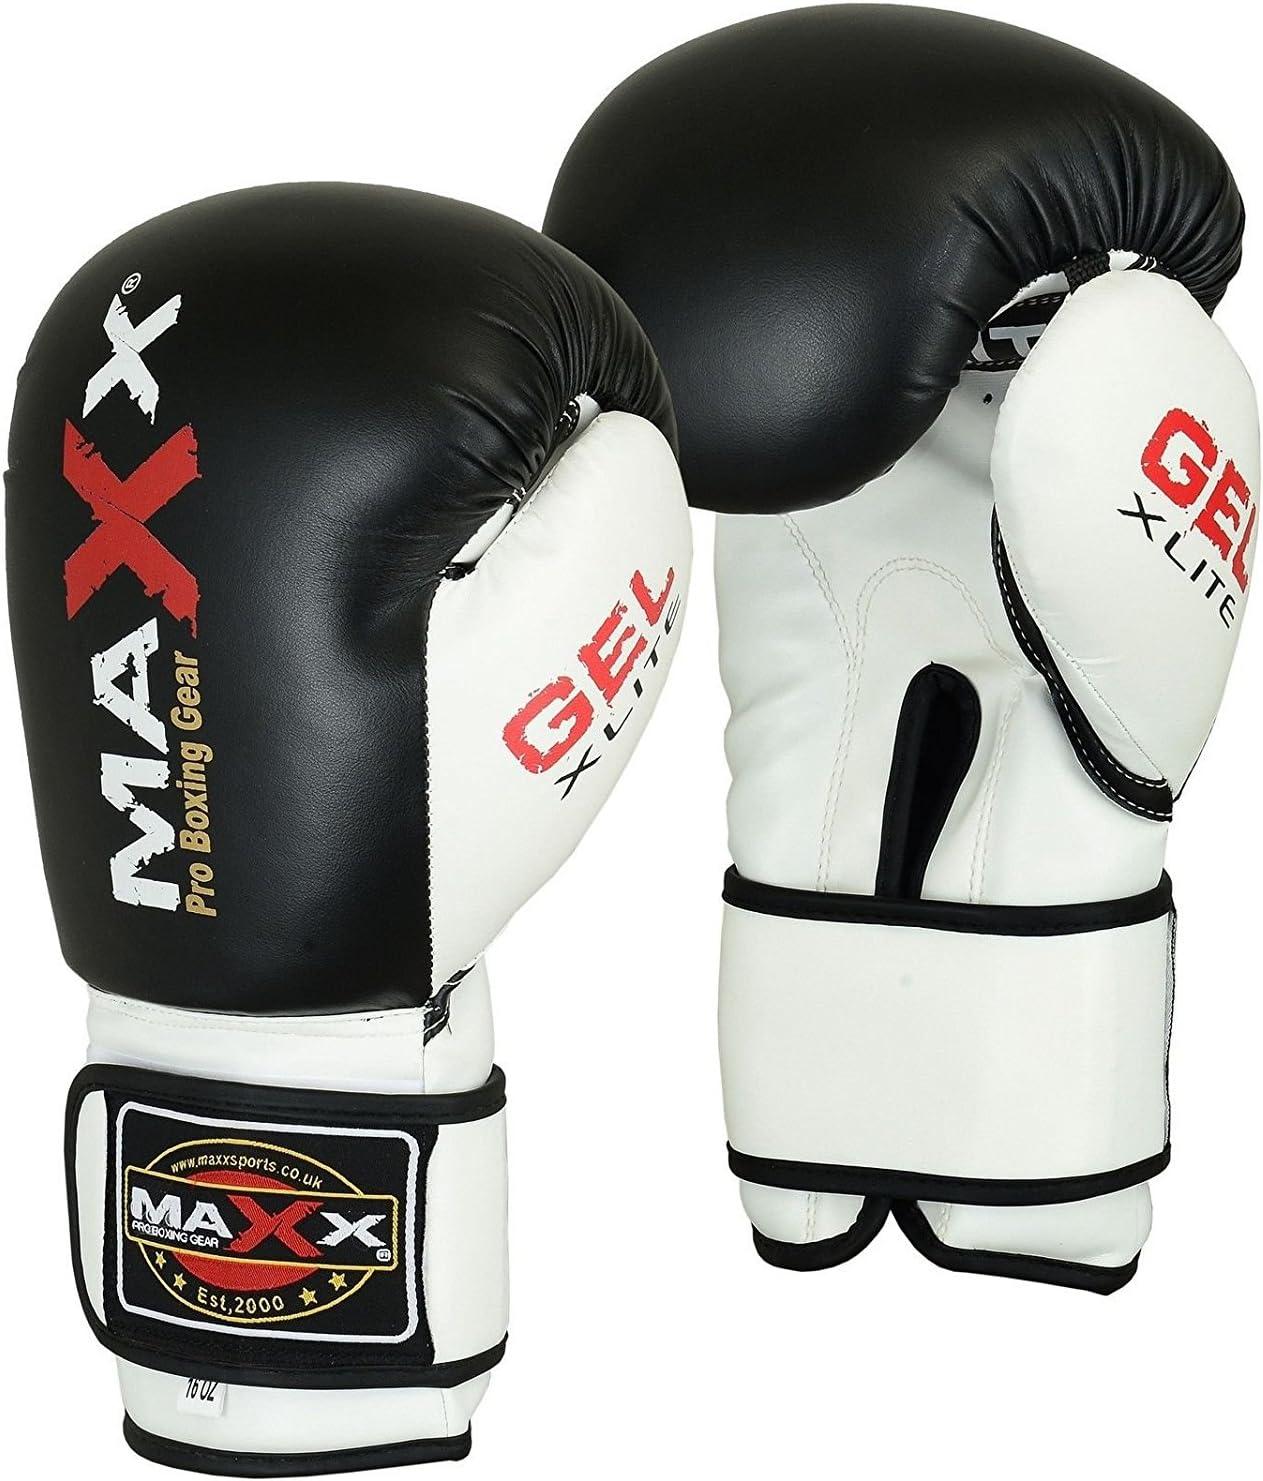 SportsMax レザーボクシンググローブ ブラック&ホワイト パンチバッグ 武道用 10オンス